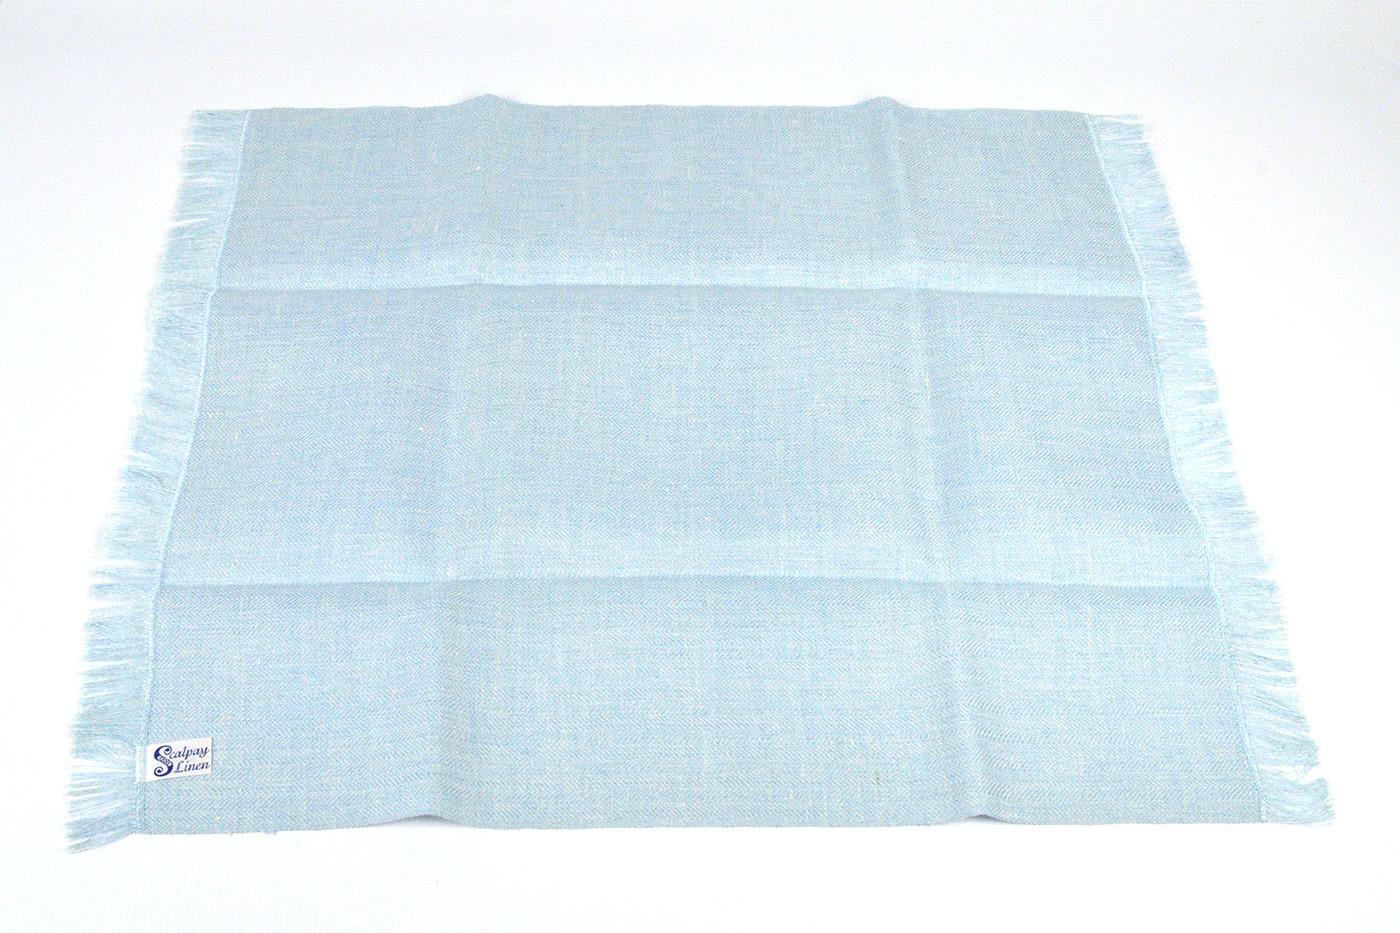 Scalpay Linen Napkin